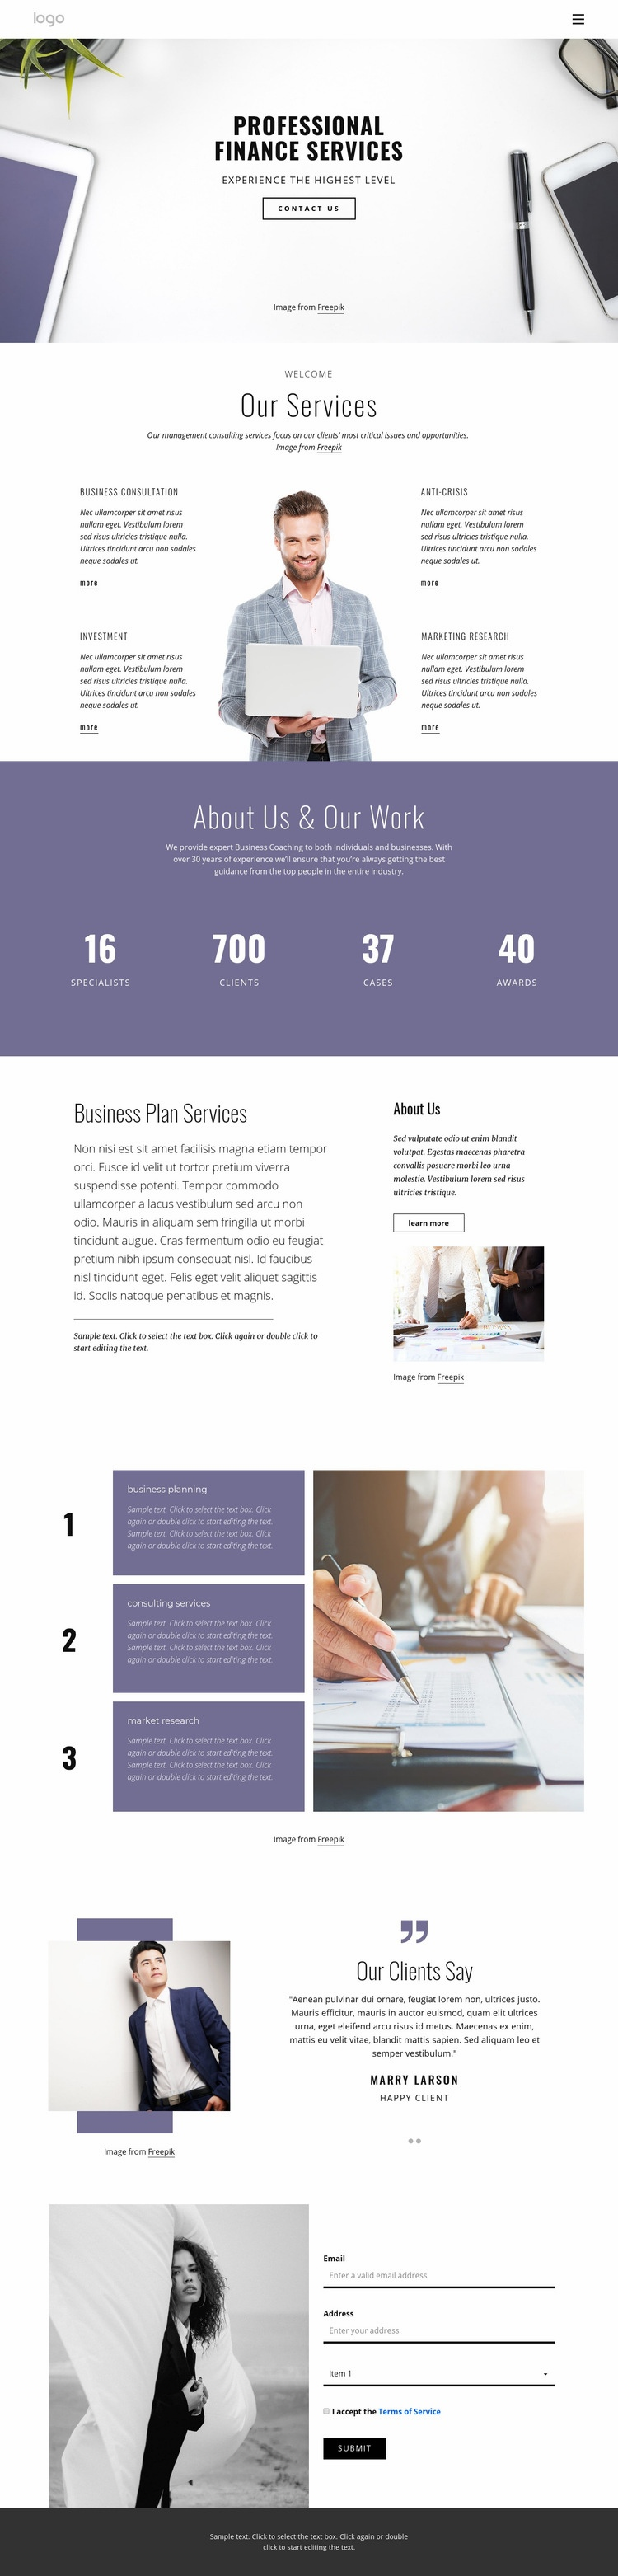 Professional finance services Web Page Designer